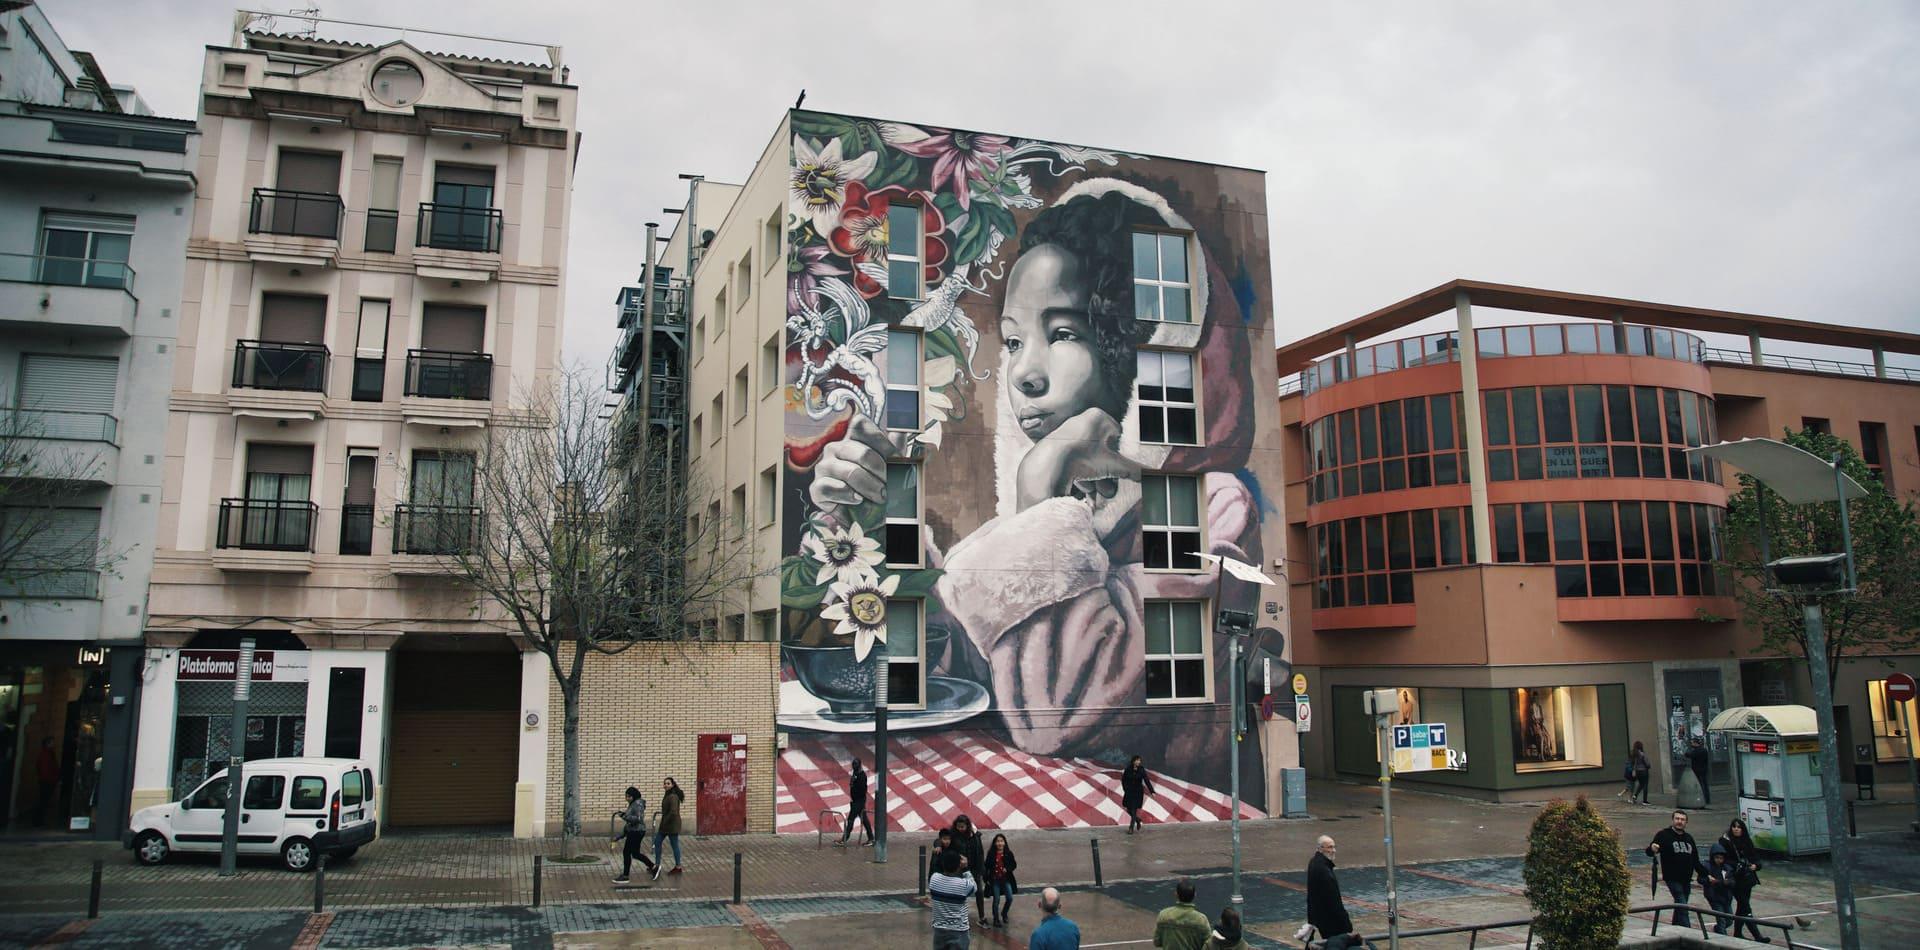 Mural de Lula Goce para el proyecto Womart, Vilanova i la Geltrú, 2018